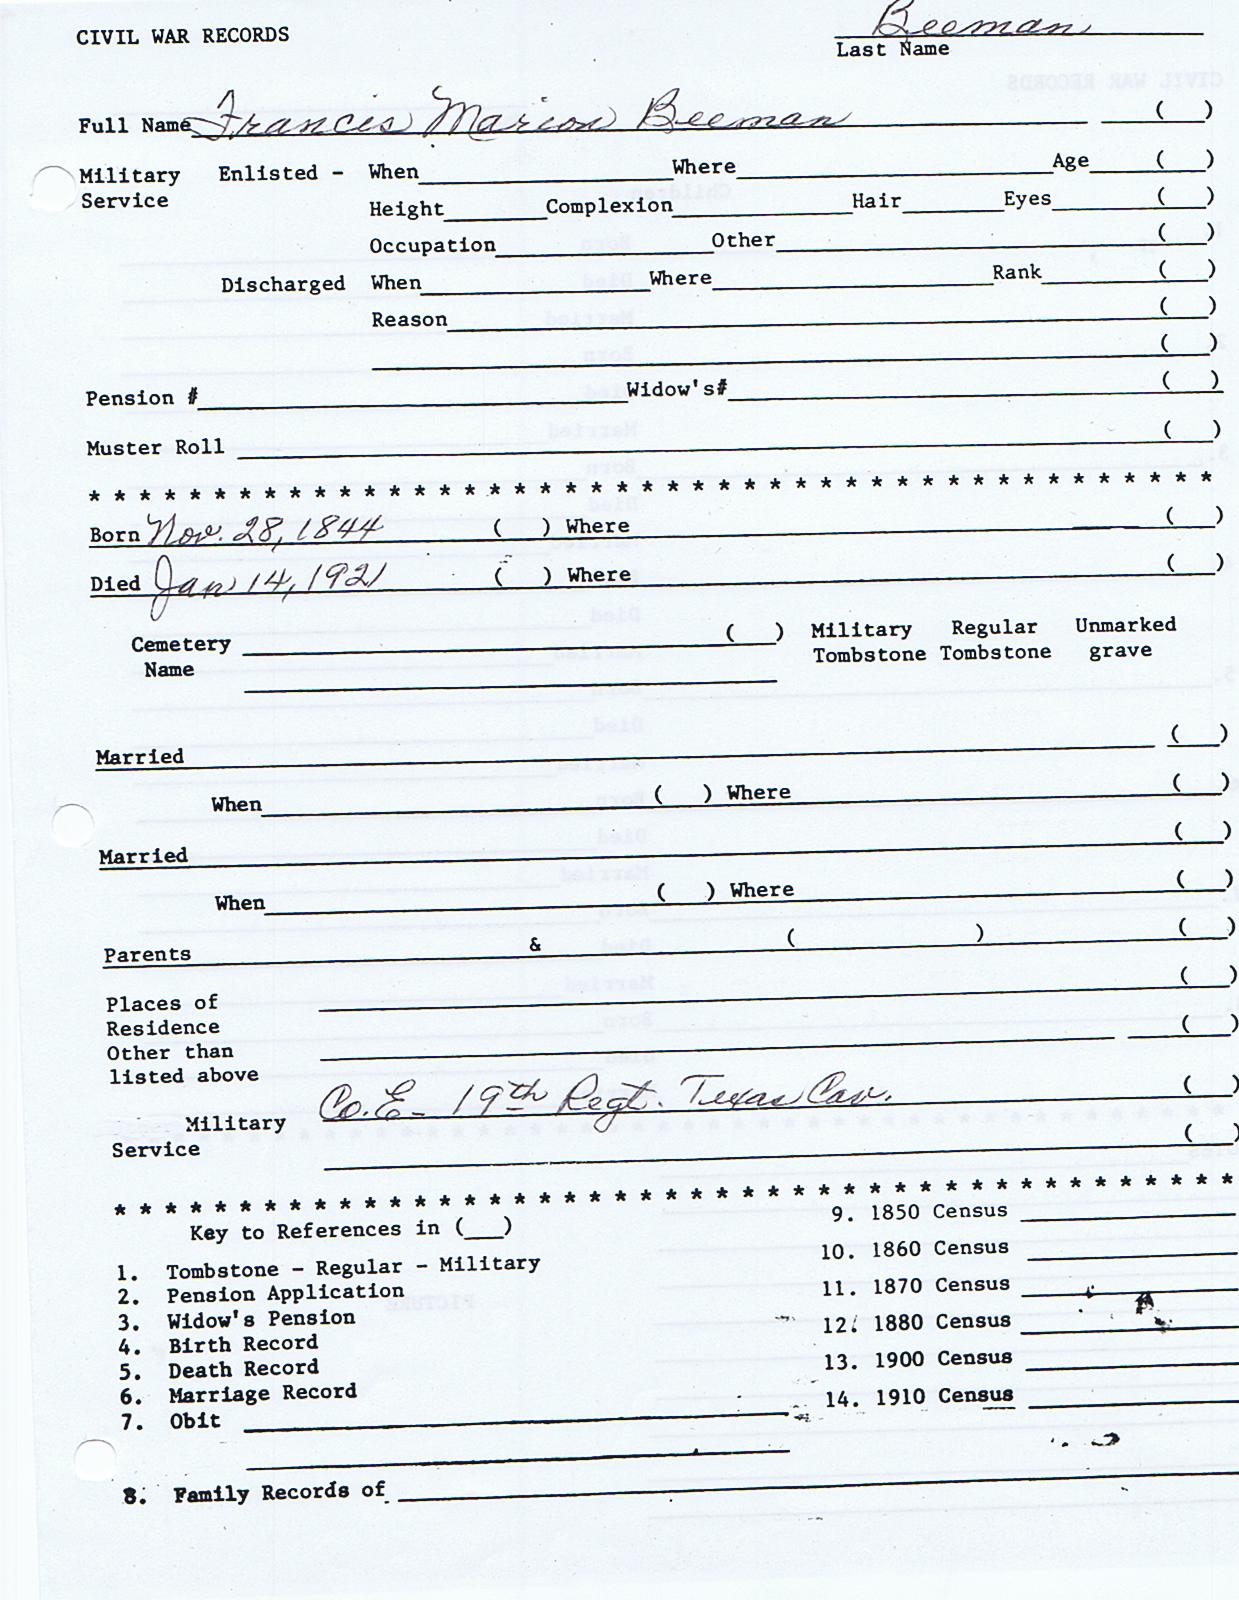 beeman-kaufman_civil_war_records-3502